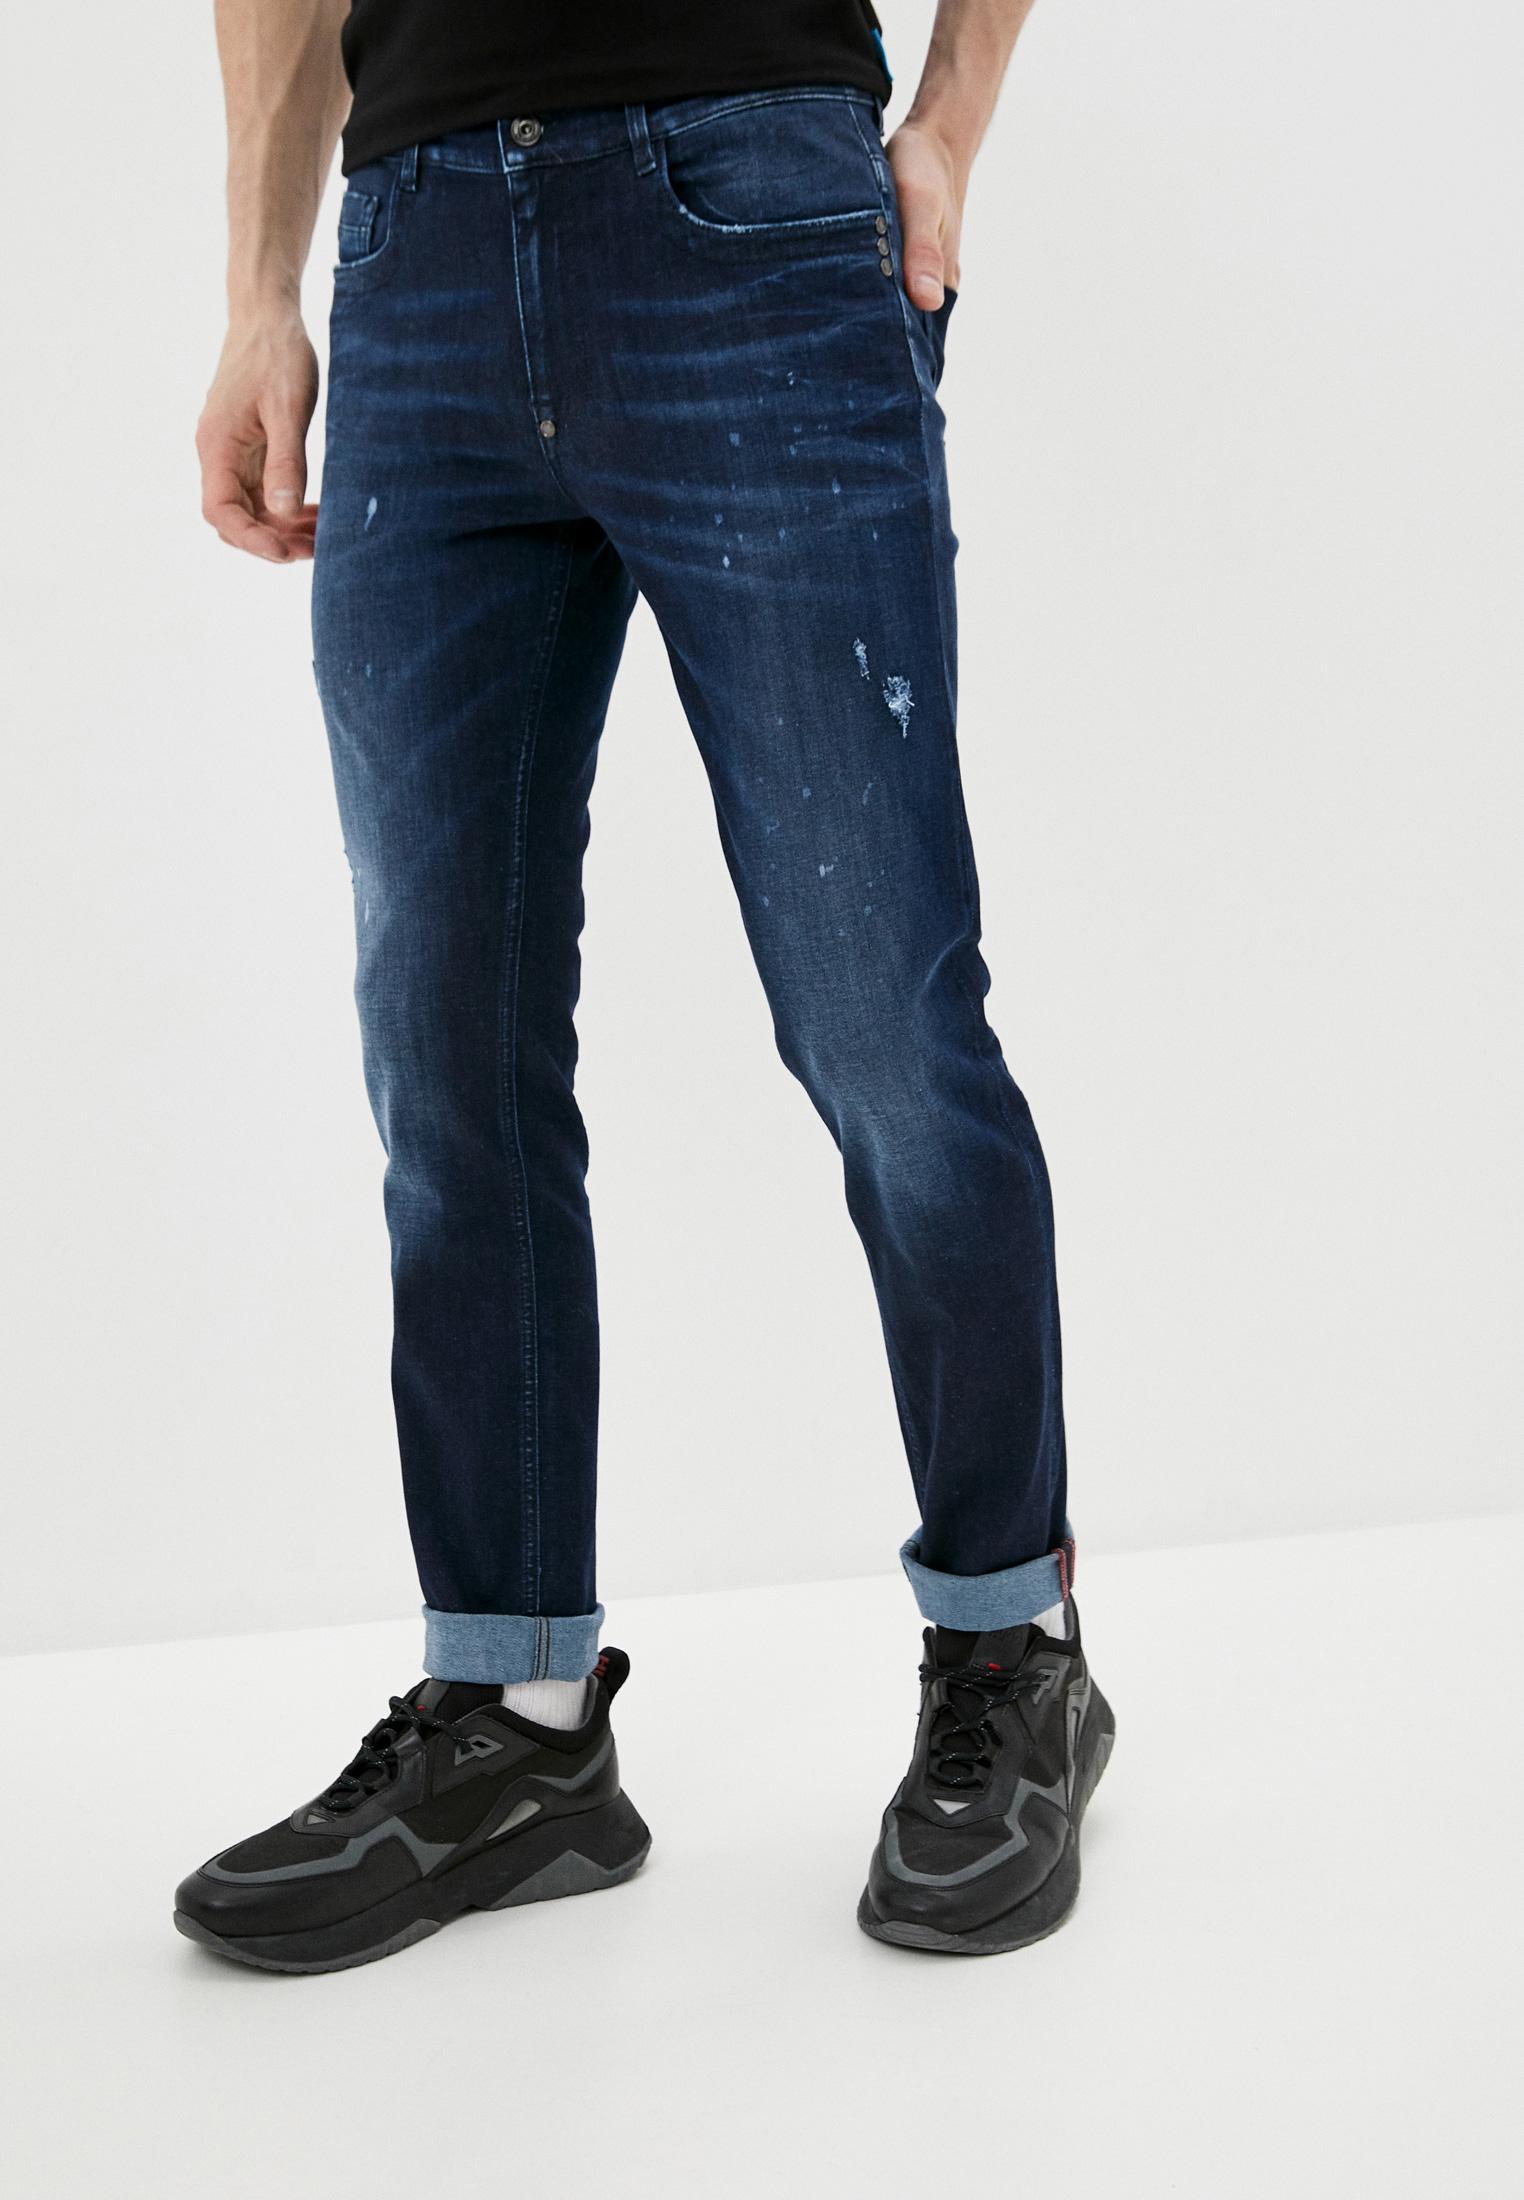 Мужские зауженные джинсы Bikkembergs (Биккембергс) C Q 101 22 S 3511